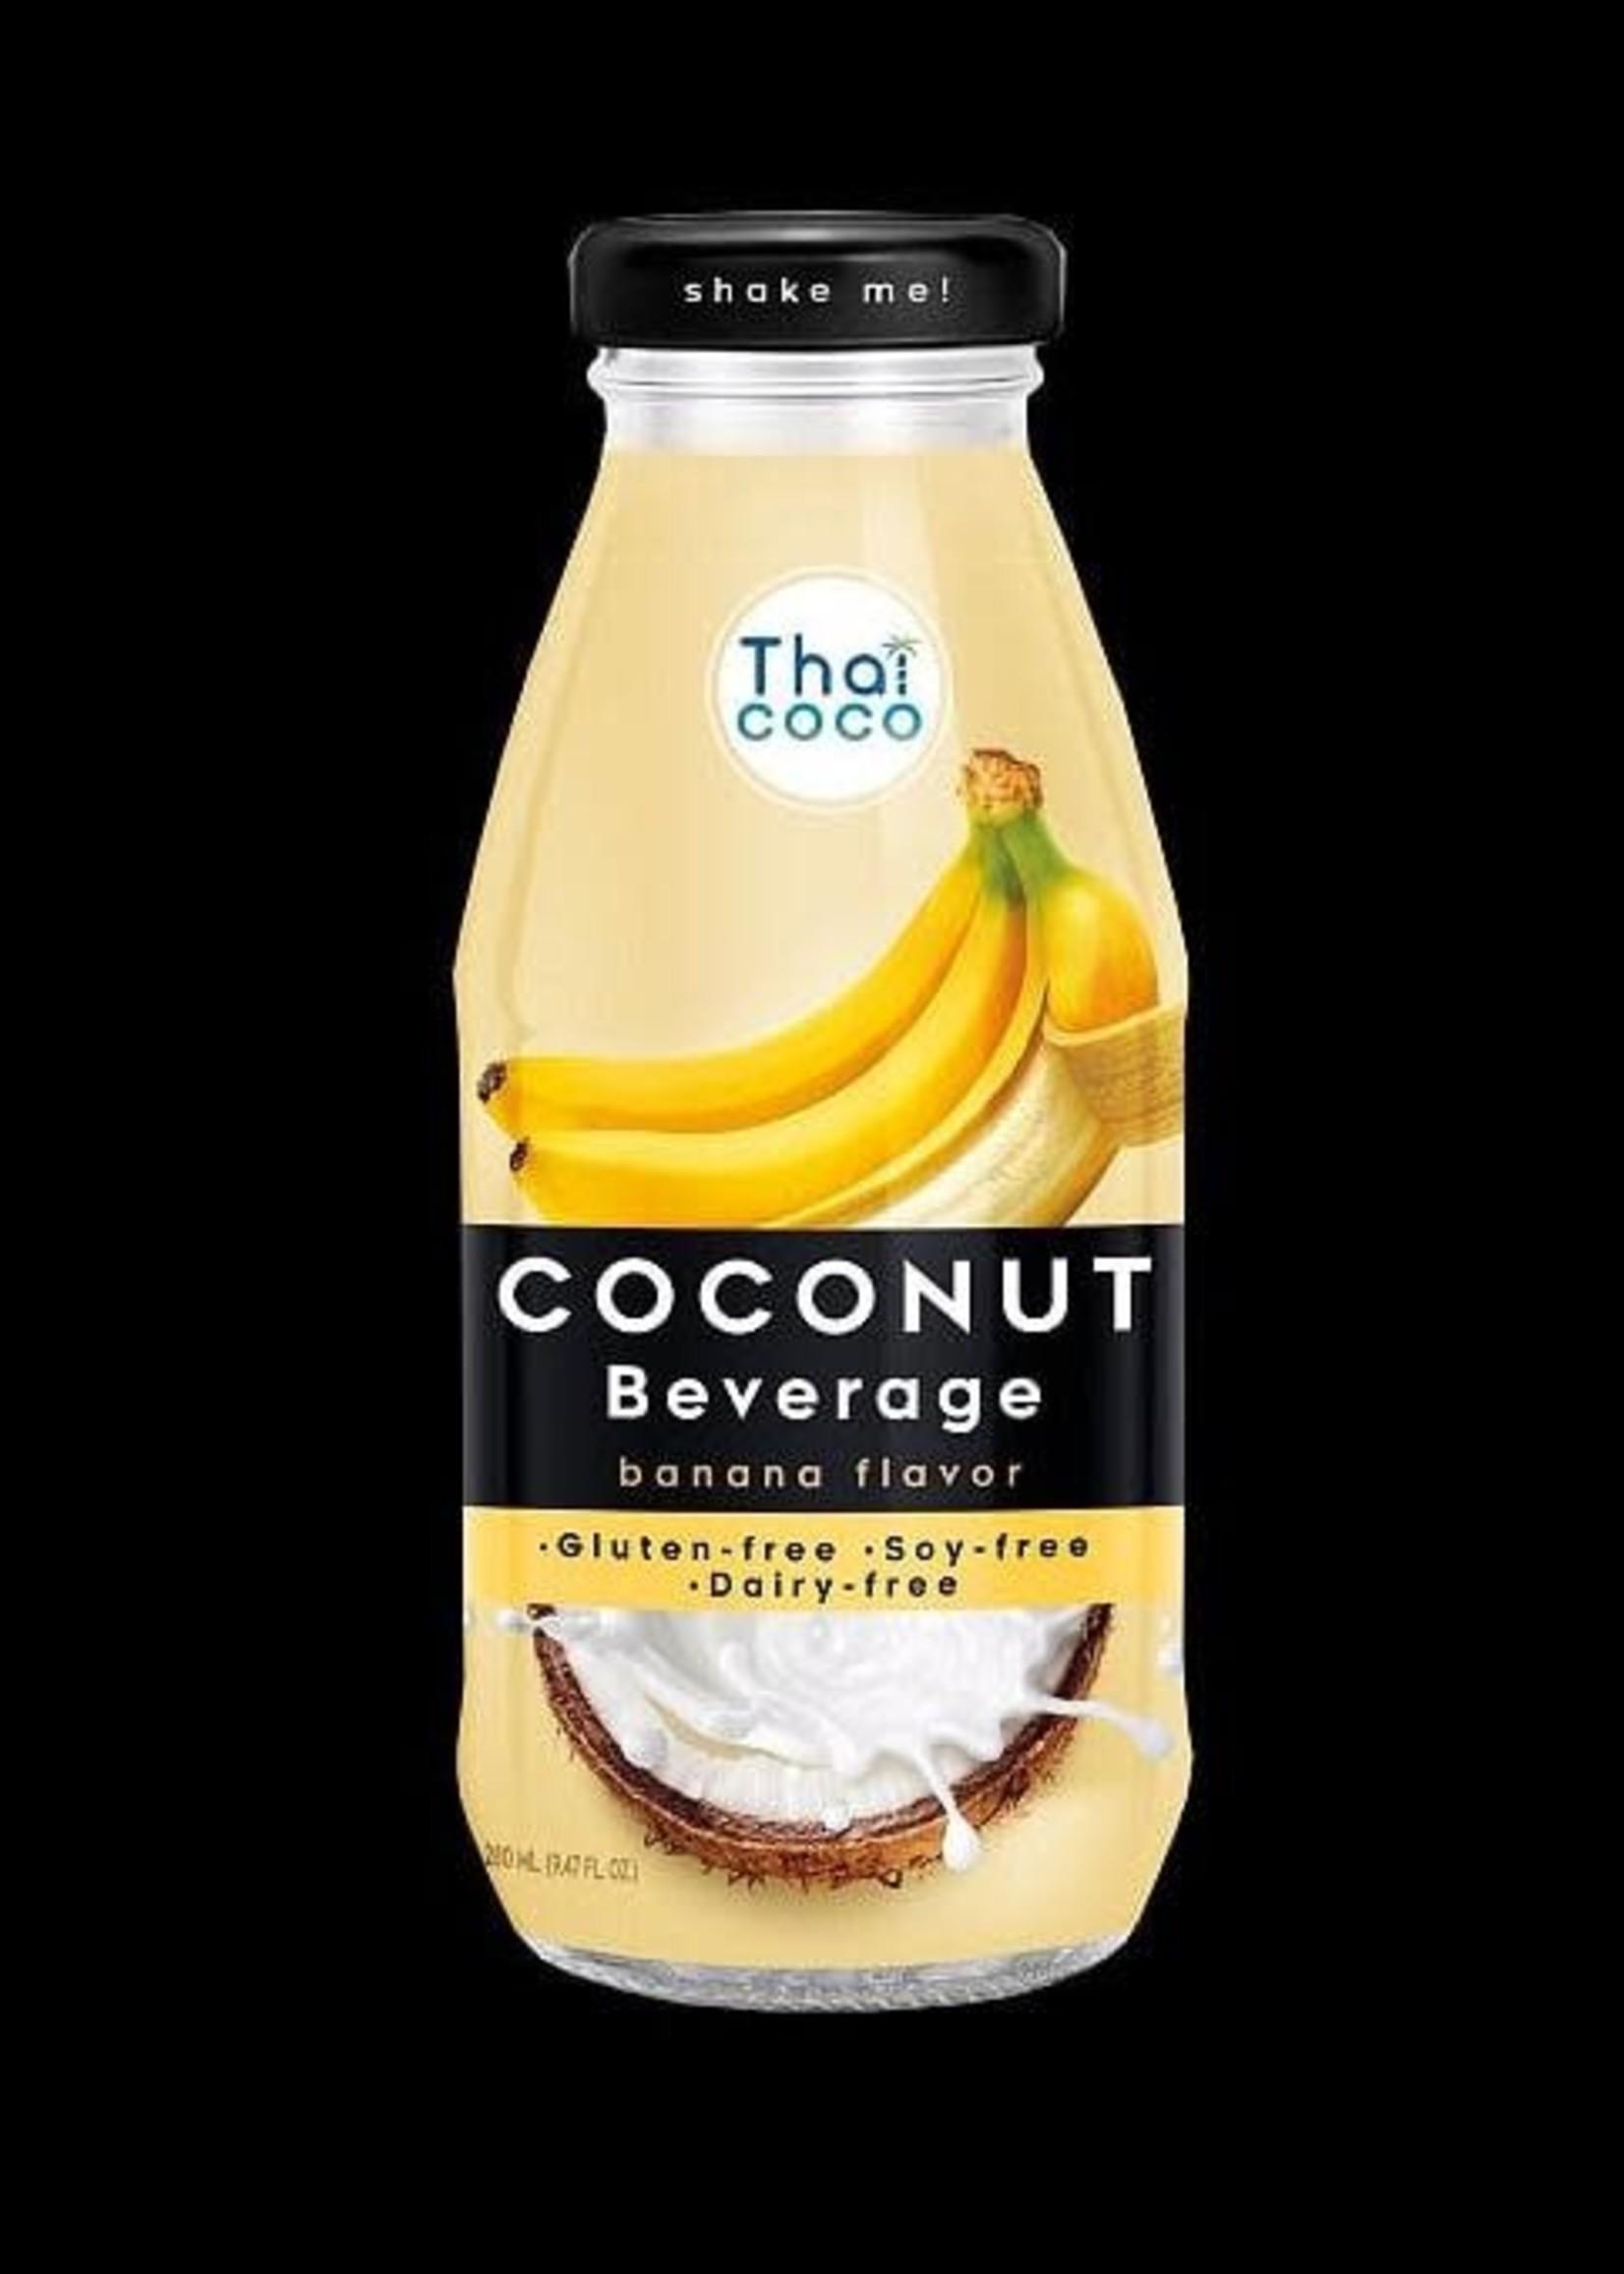 Thai Coco - banana